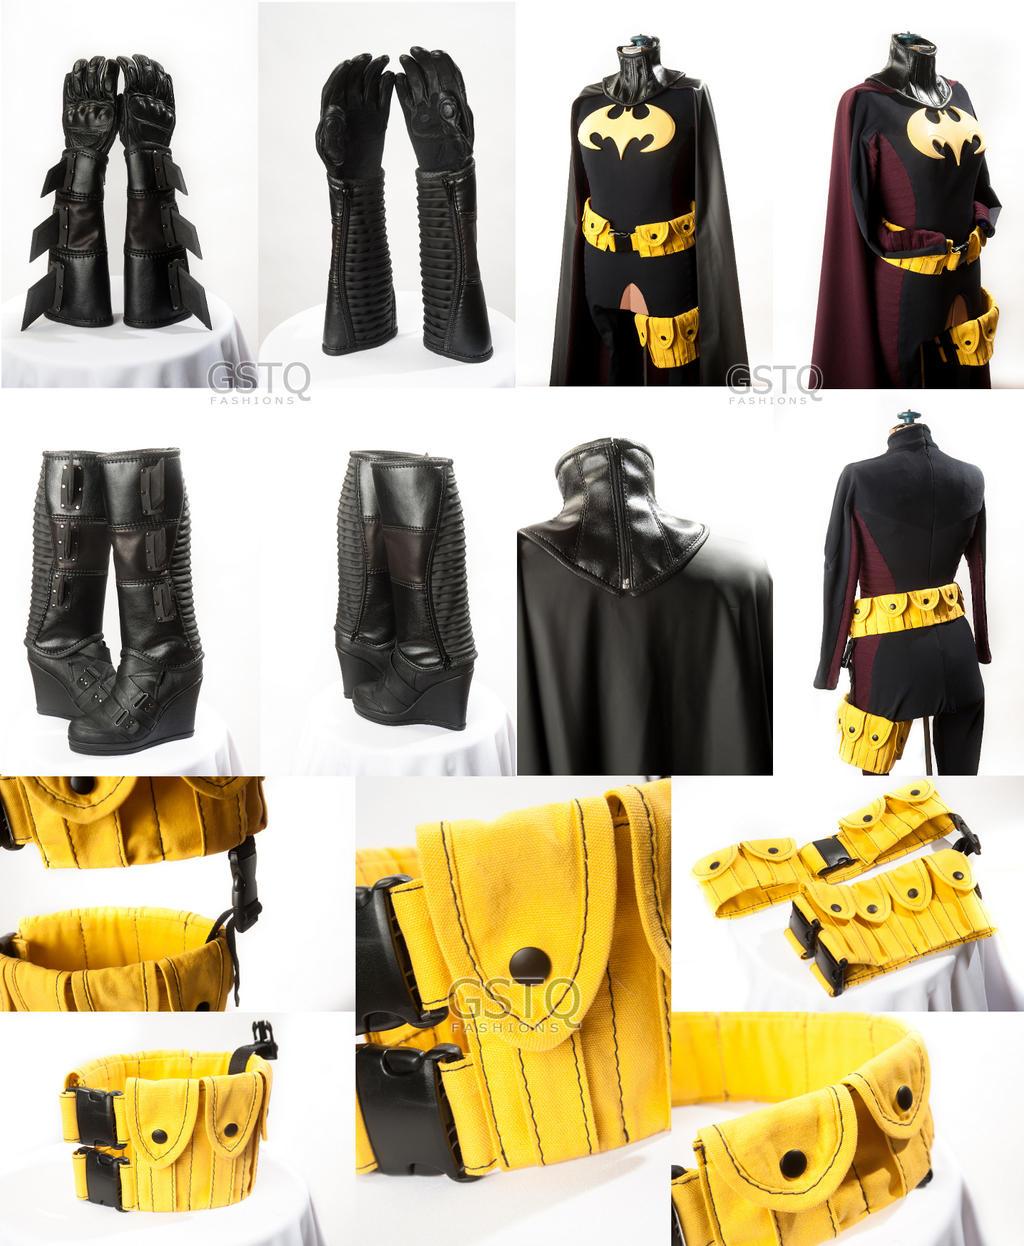 Stephanie Brown Batgirl Costume By Gstqfashions On Deviantart